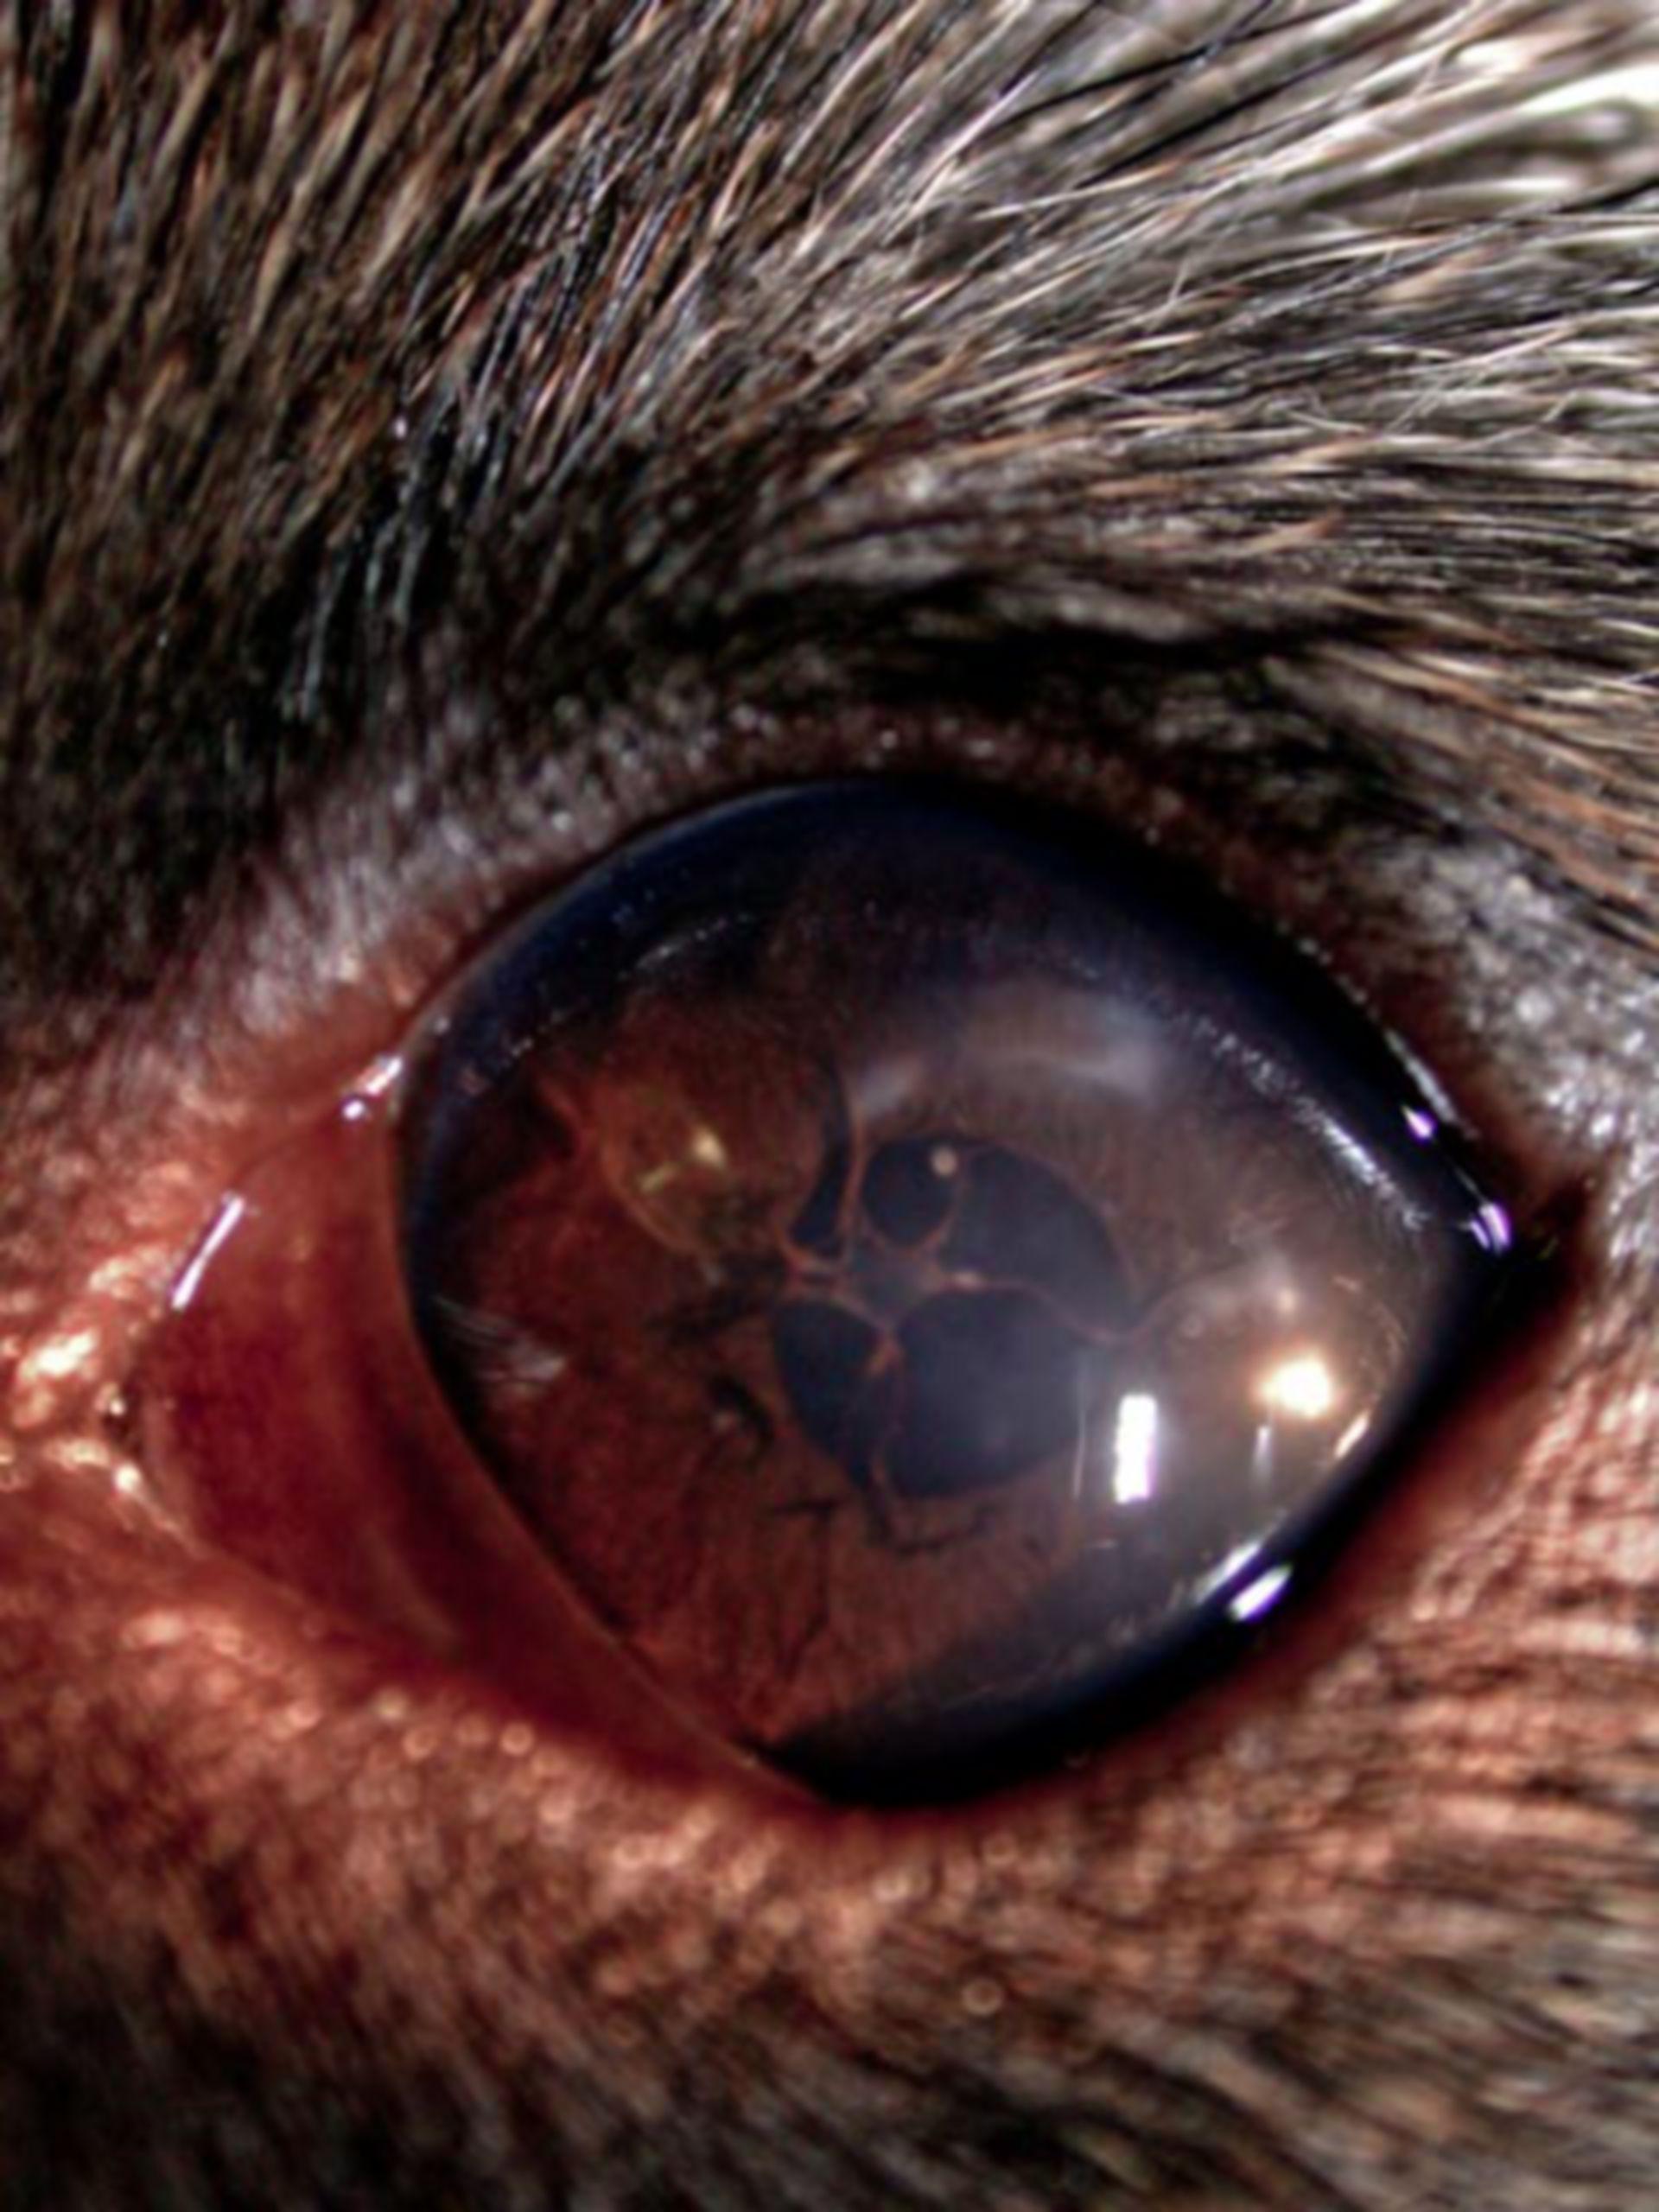 Persistent pupillary membrane